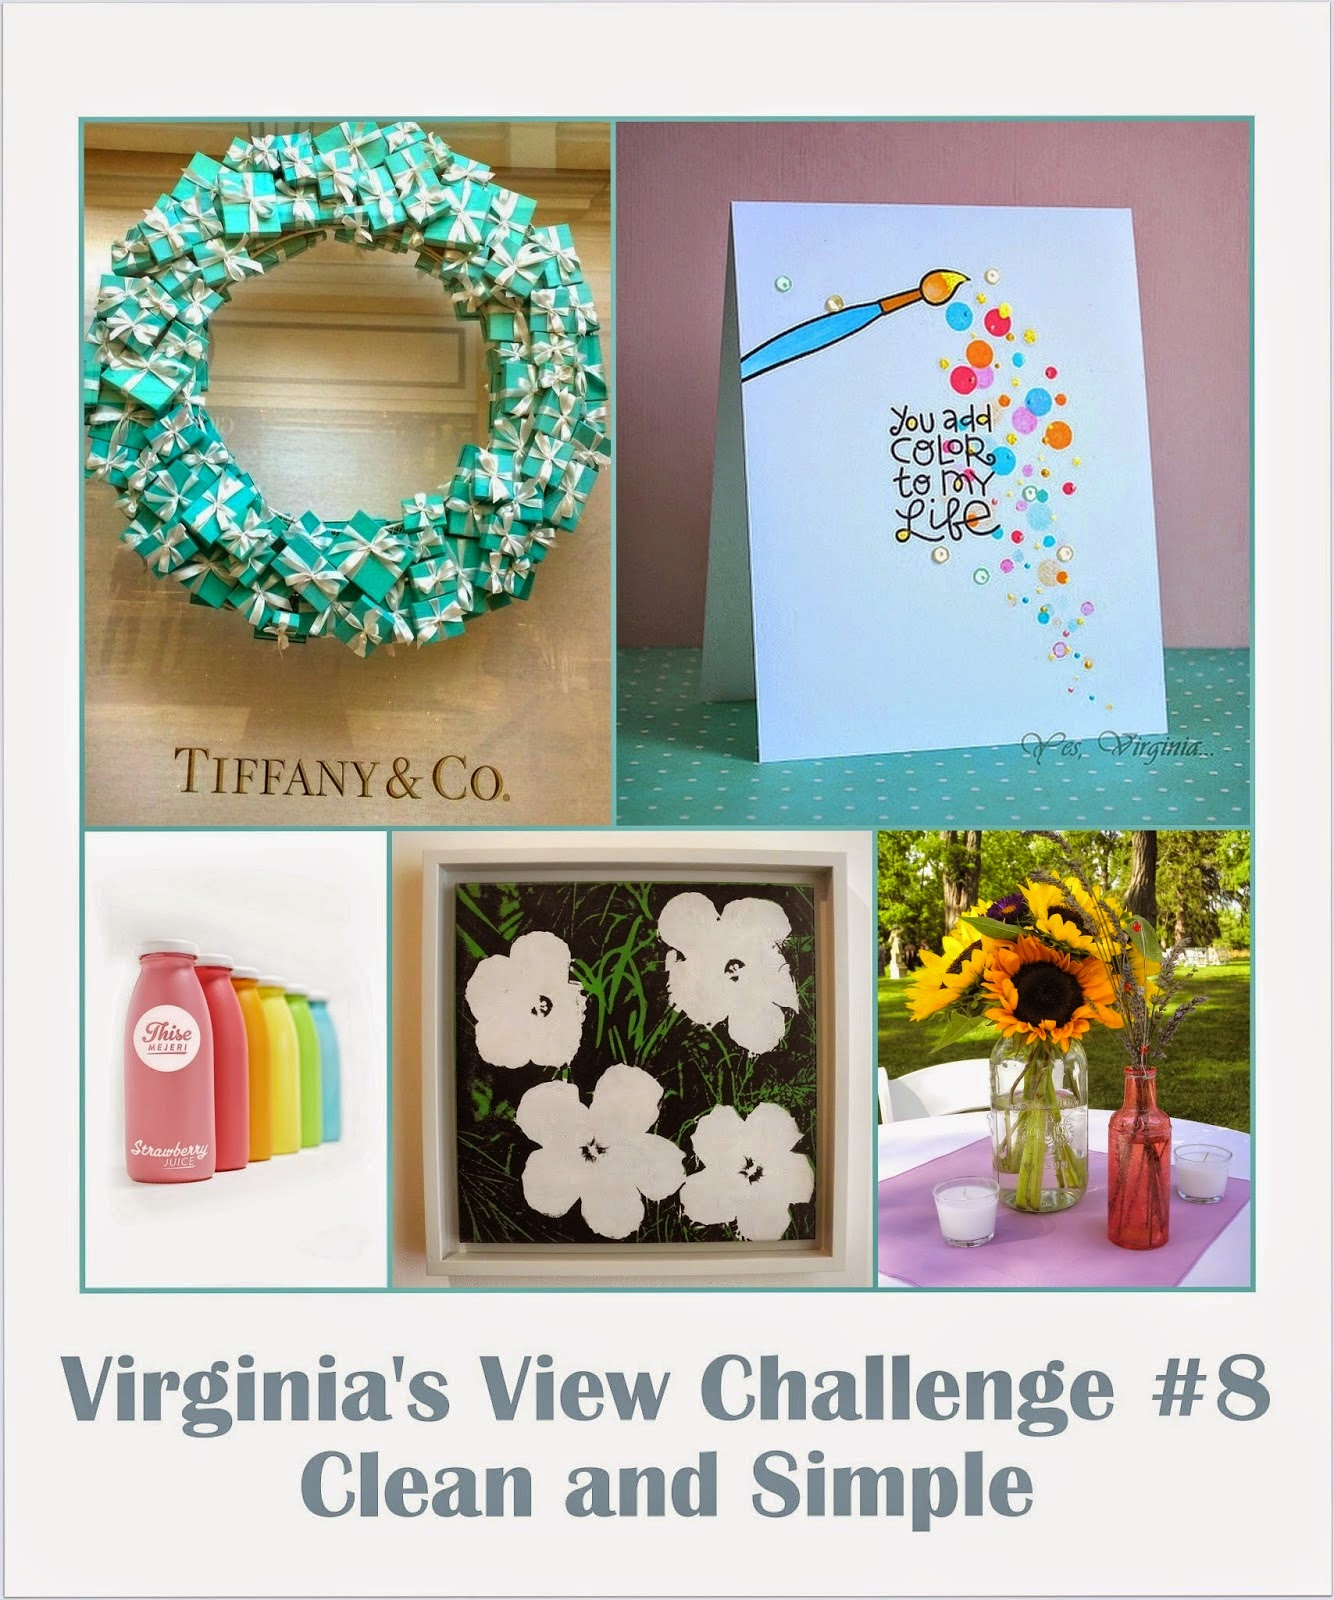 http://virginiasviewchallenge.blogspot.ca/2014/10/virginias-view-challenge-8.html